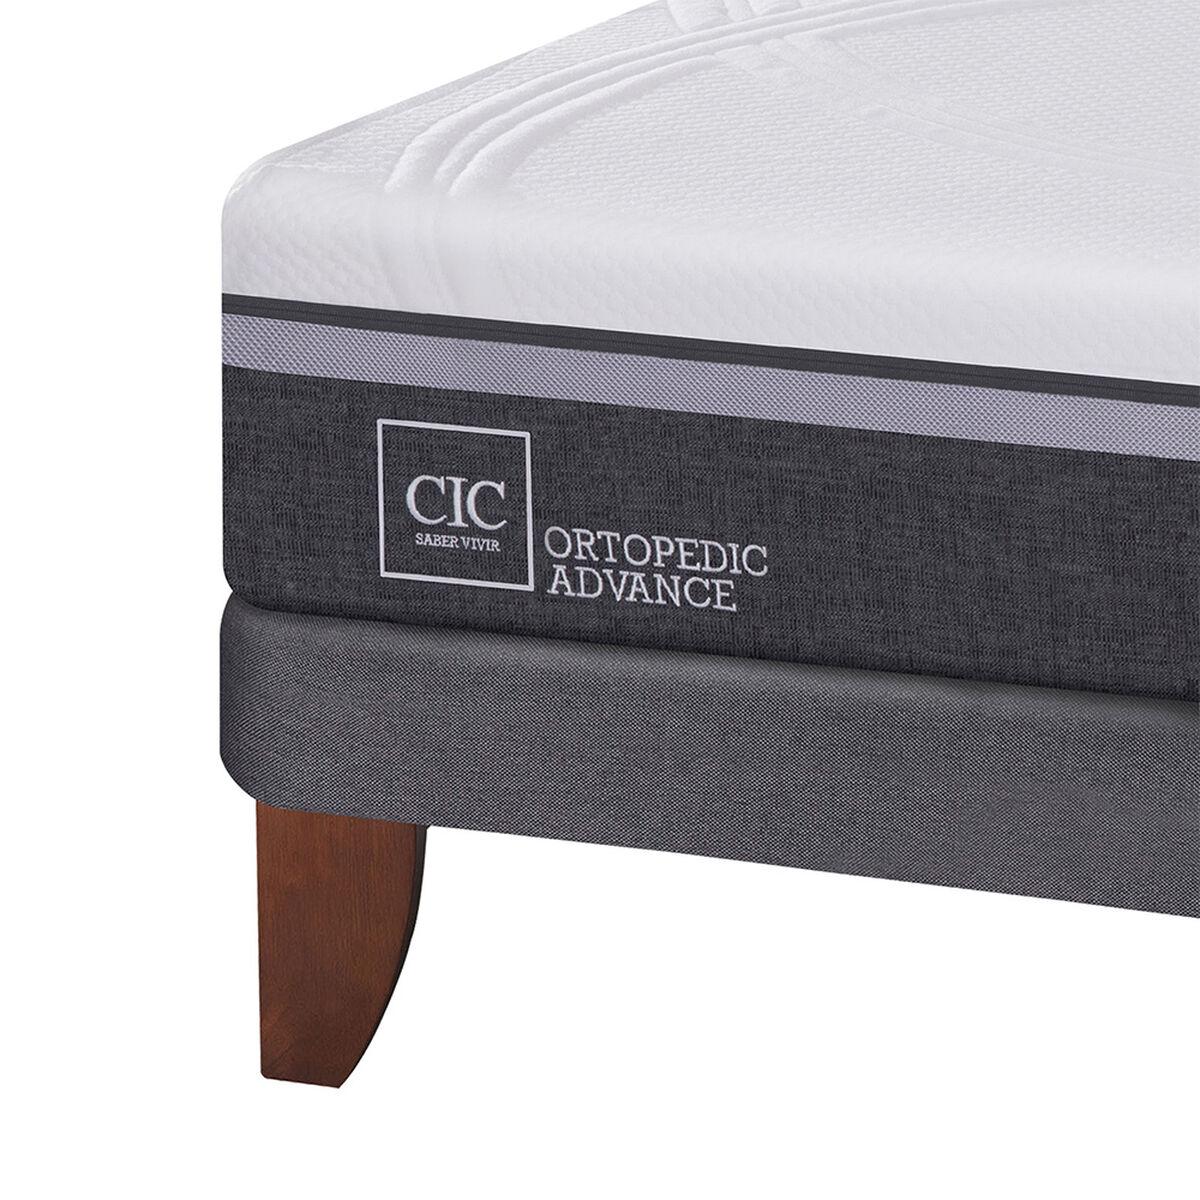 Cama Europea CIC King Ortopedic Advance + Velador + Respaldo